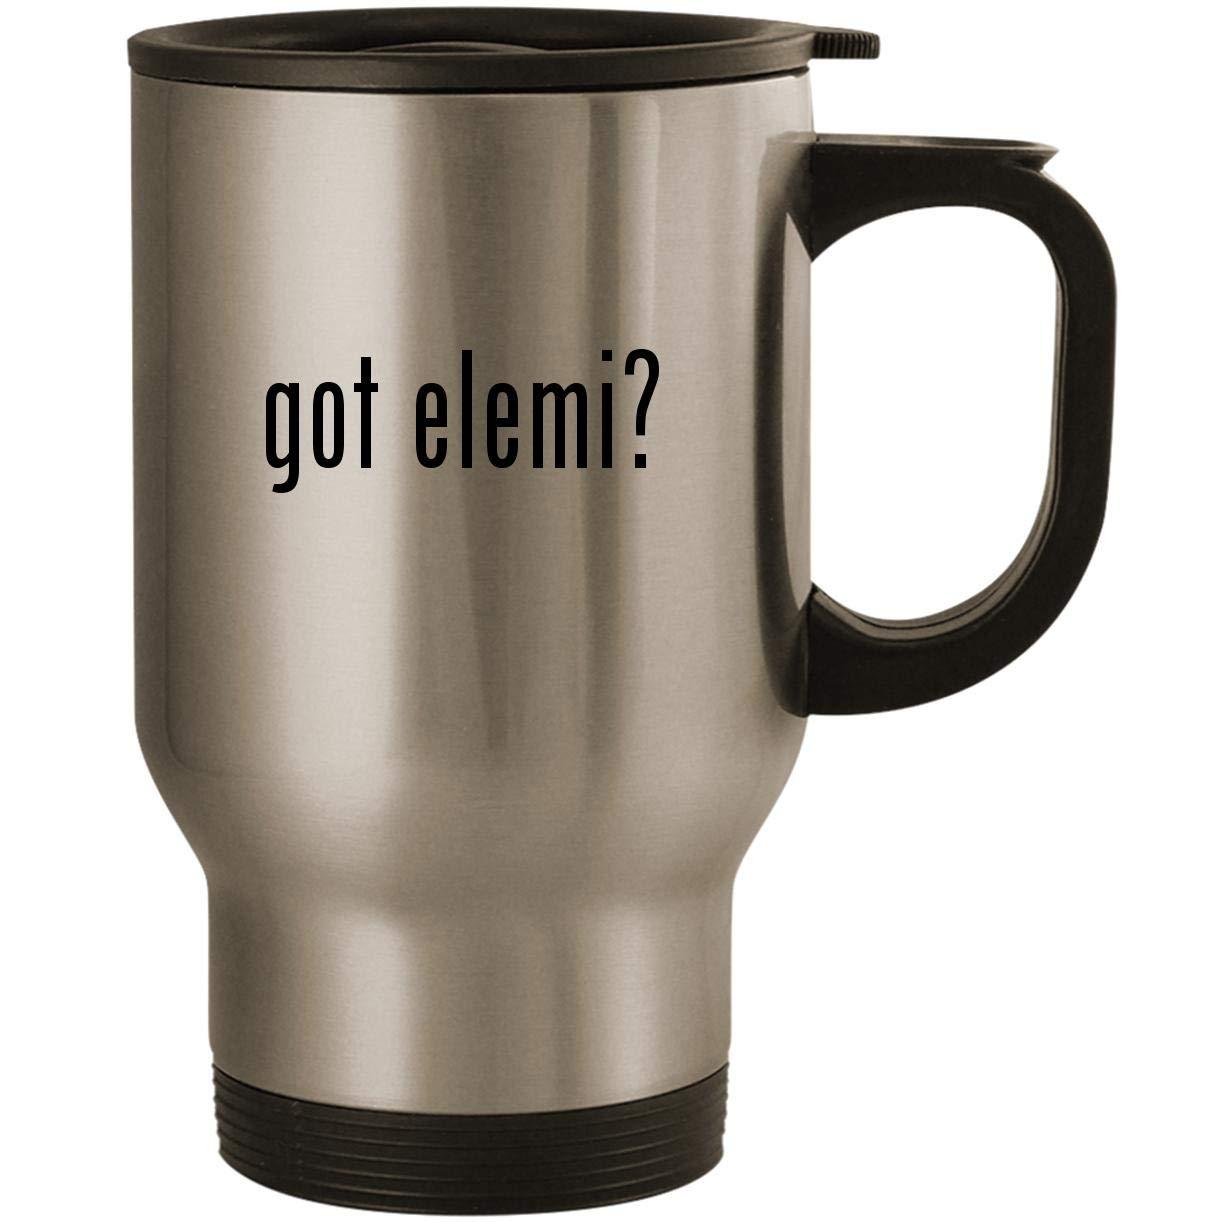 got elemi? - Stainless Steel 14oz Road Ready Travel Mug, Silver